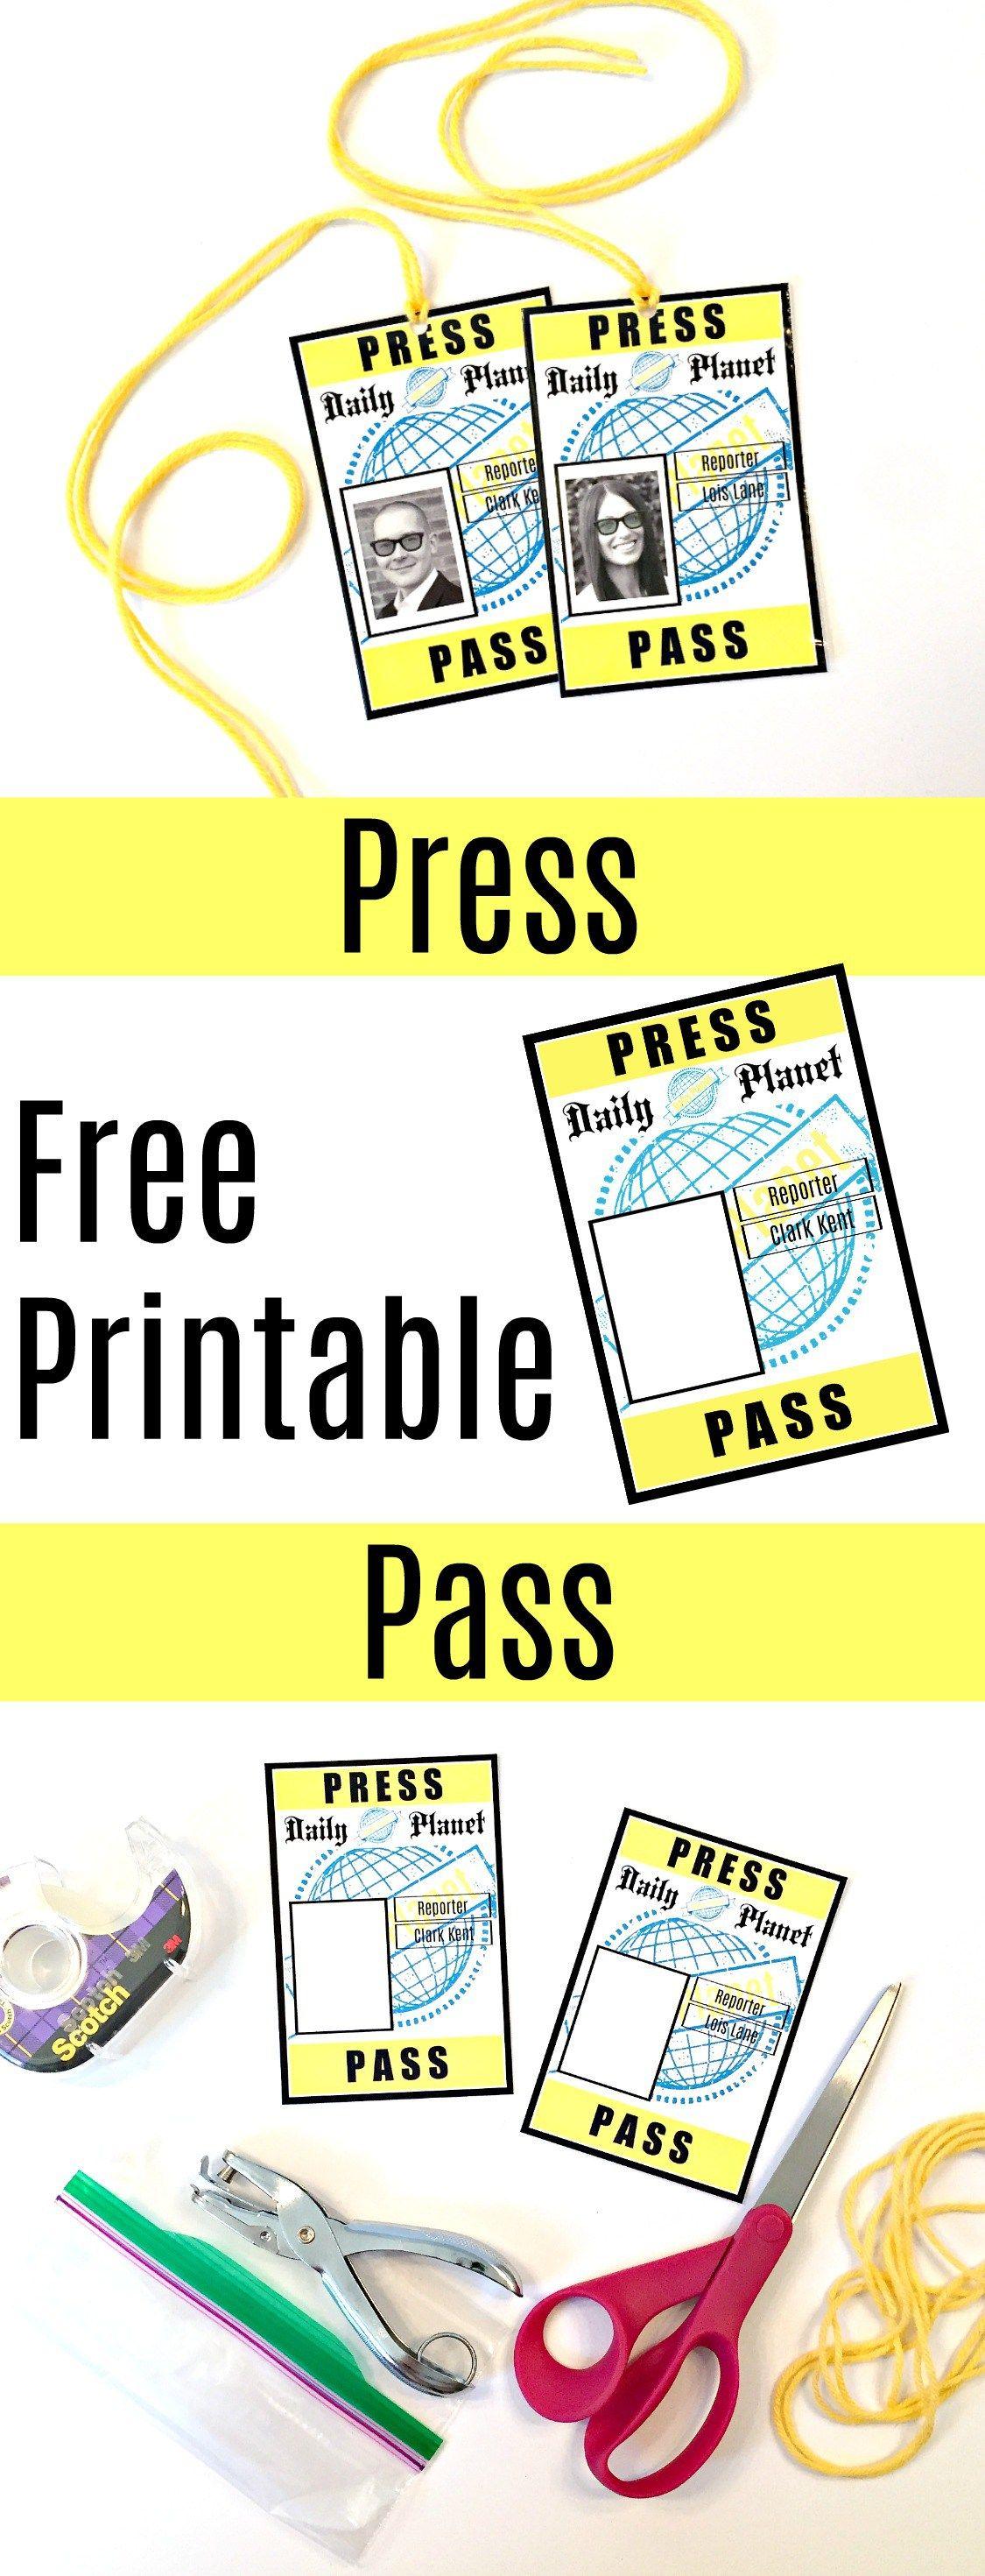 Free Printable Press Pass For Lois Lane And Clark Kent